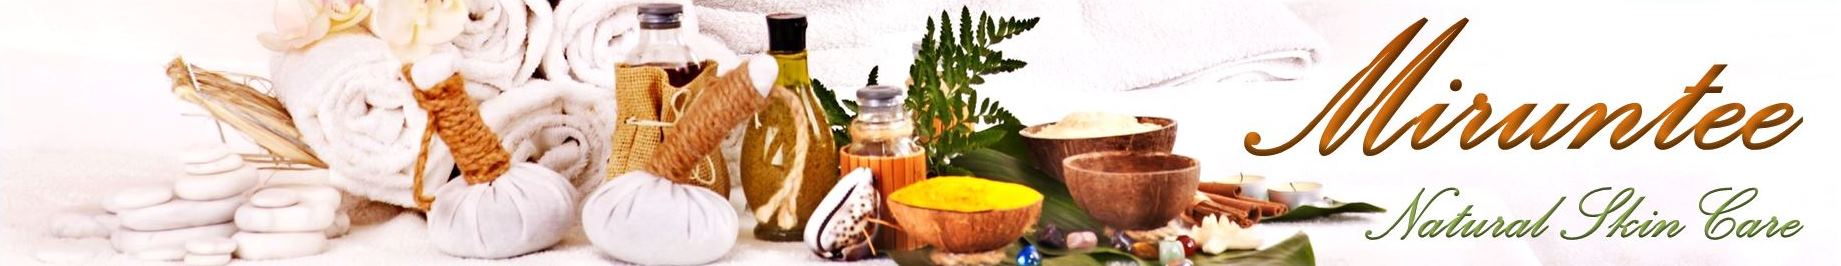 Miruntee Natural Skin Care